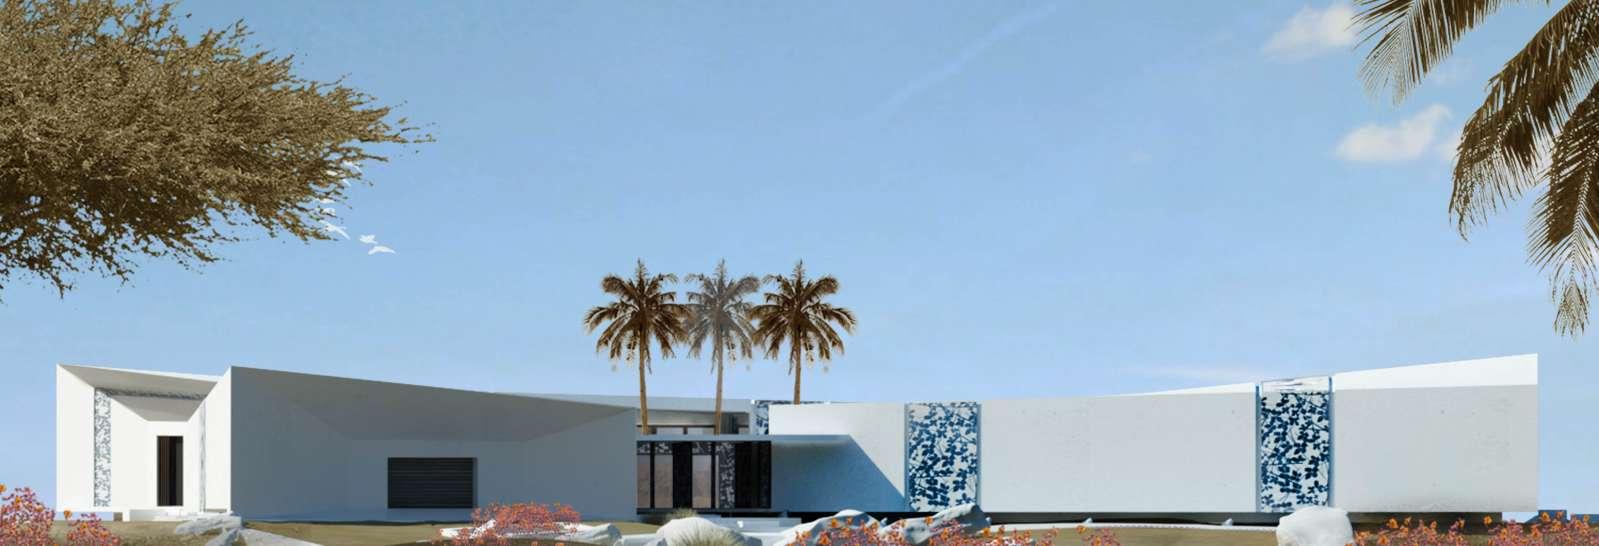 14-Alkhozama-Desert-Casa-de-Ark-Kassam-Arquitectos